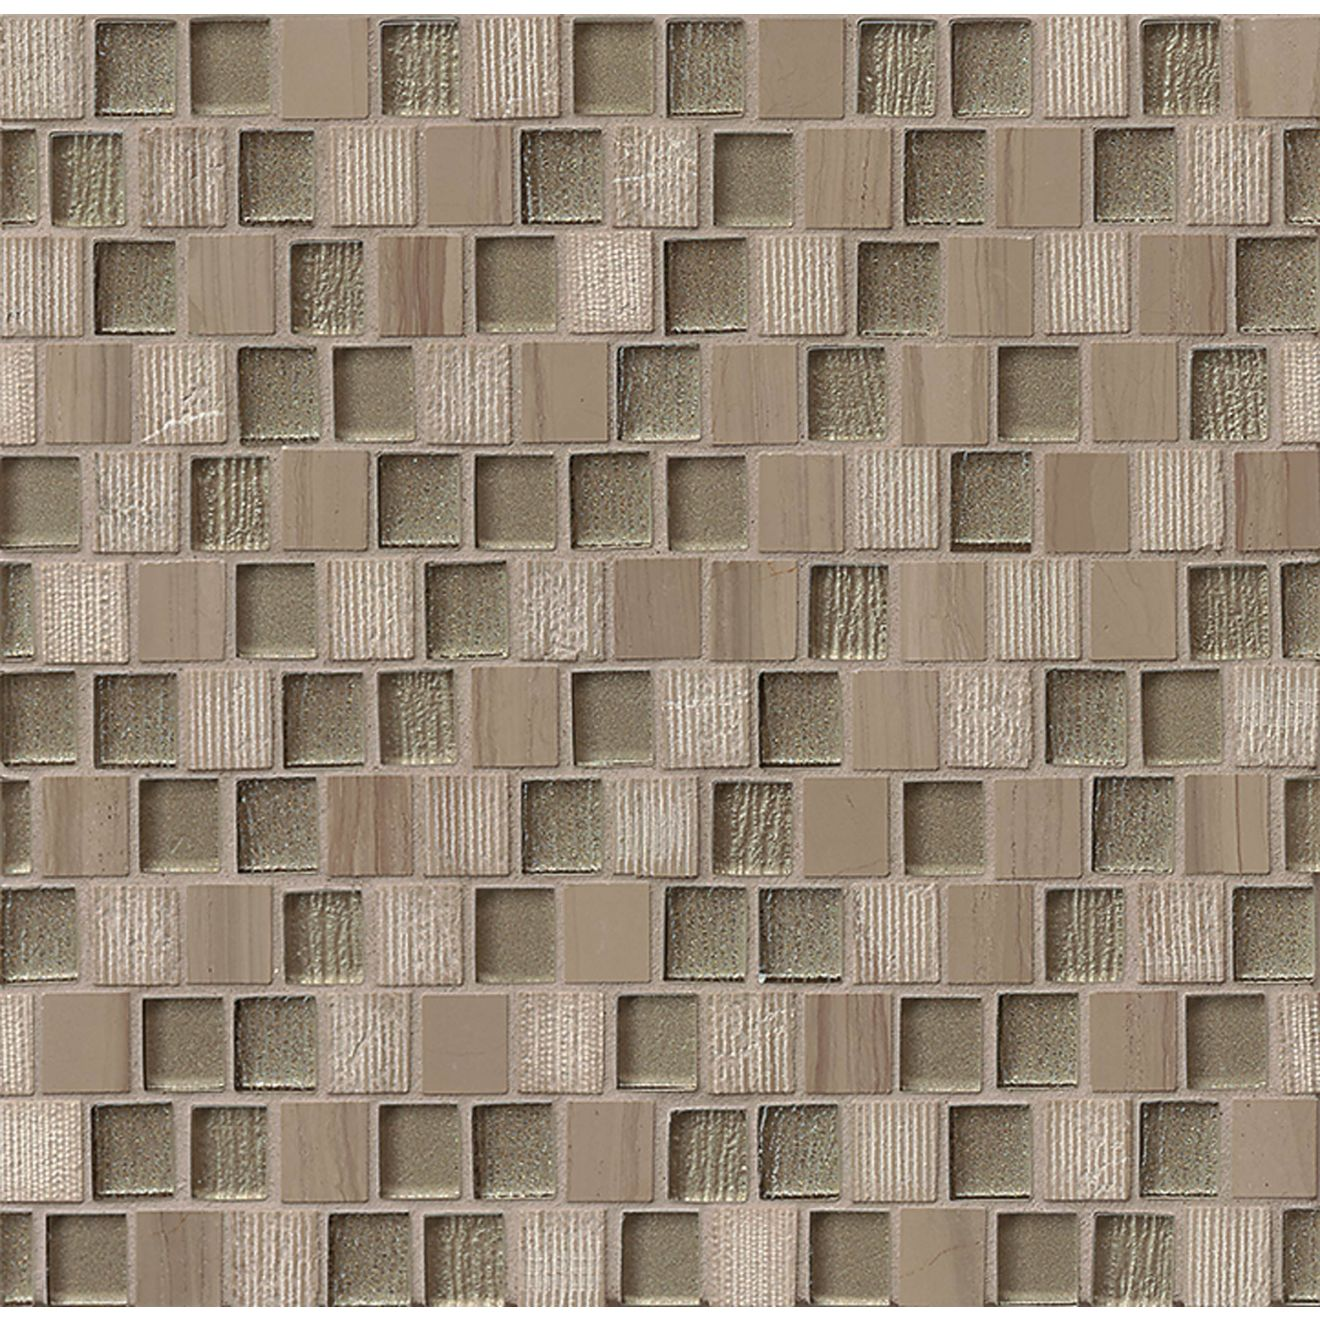 "Tessuto 3/4"" x 1"" Wall Mosaic in Taupe"